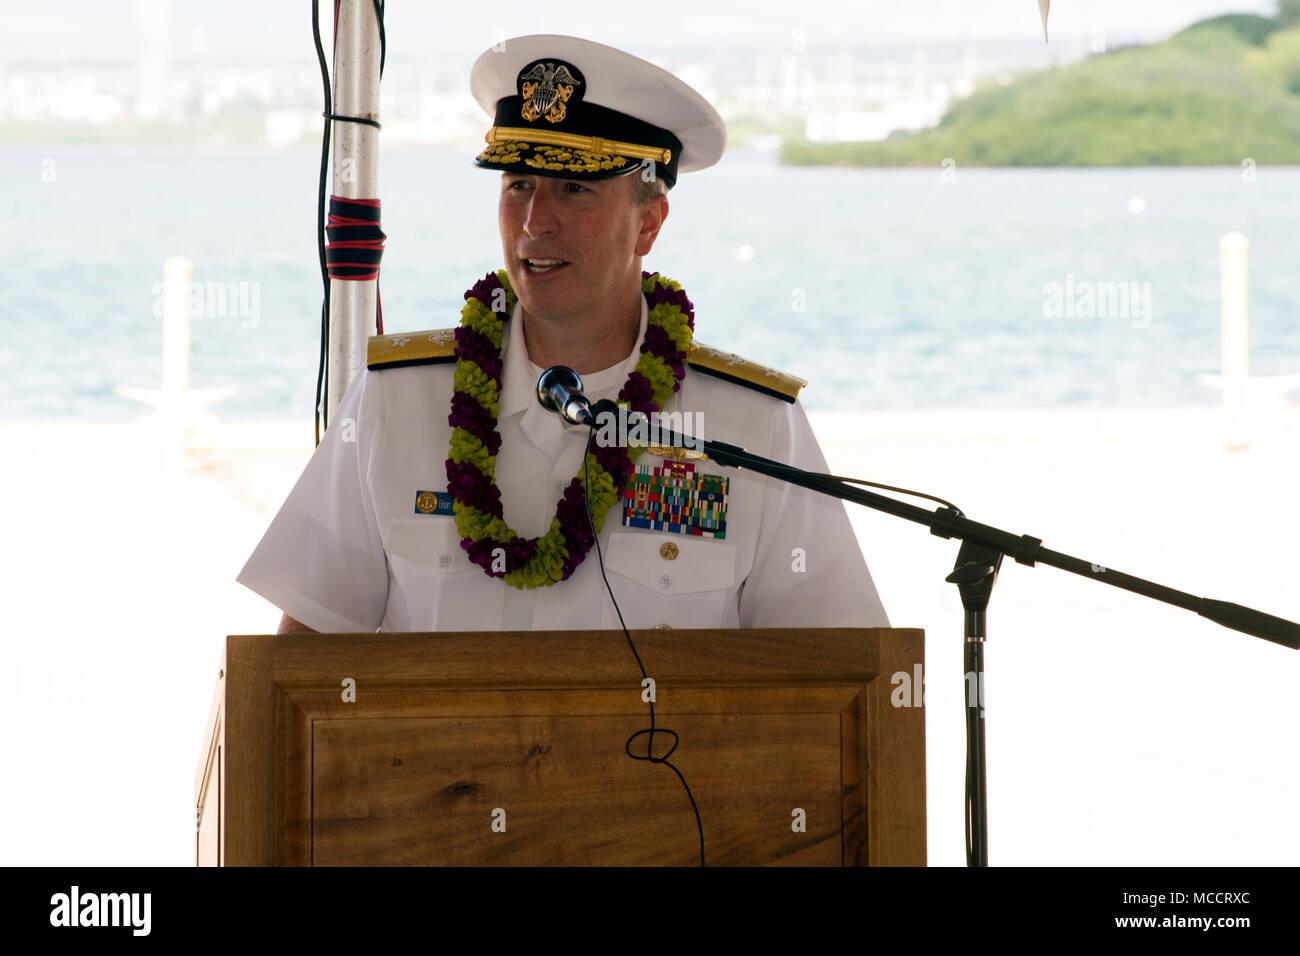 N On468 Pearl Harbor Hi Feb 10 Rear